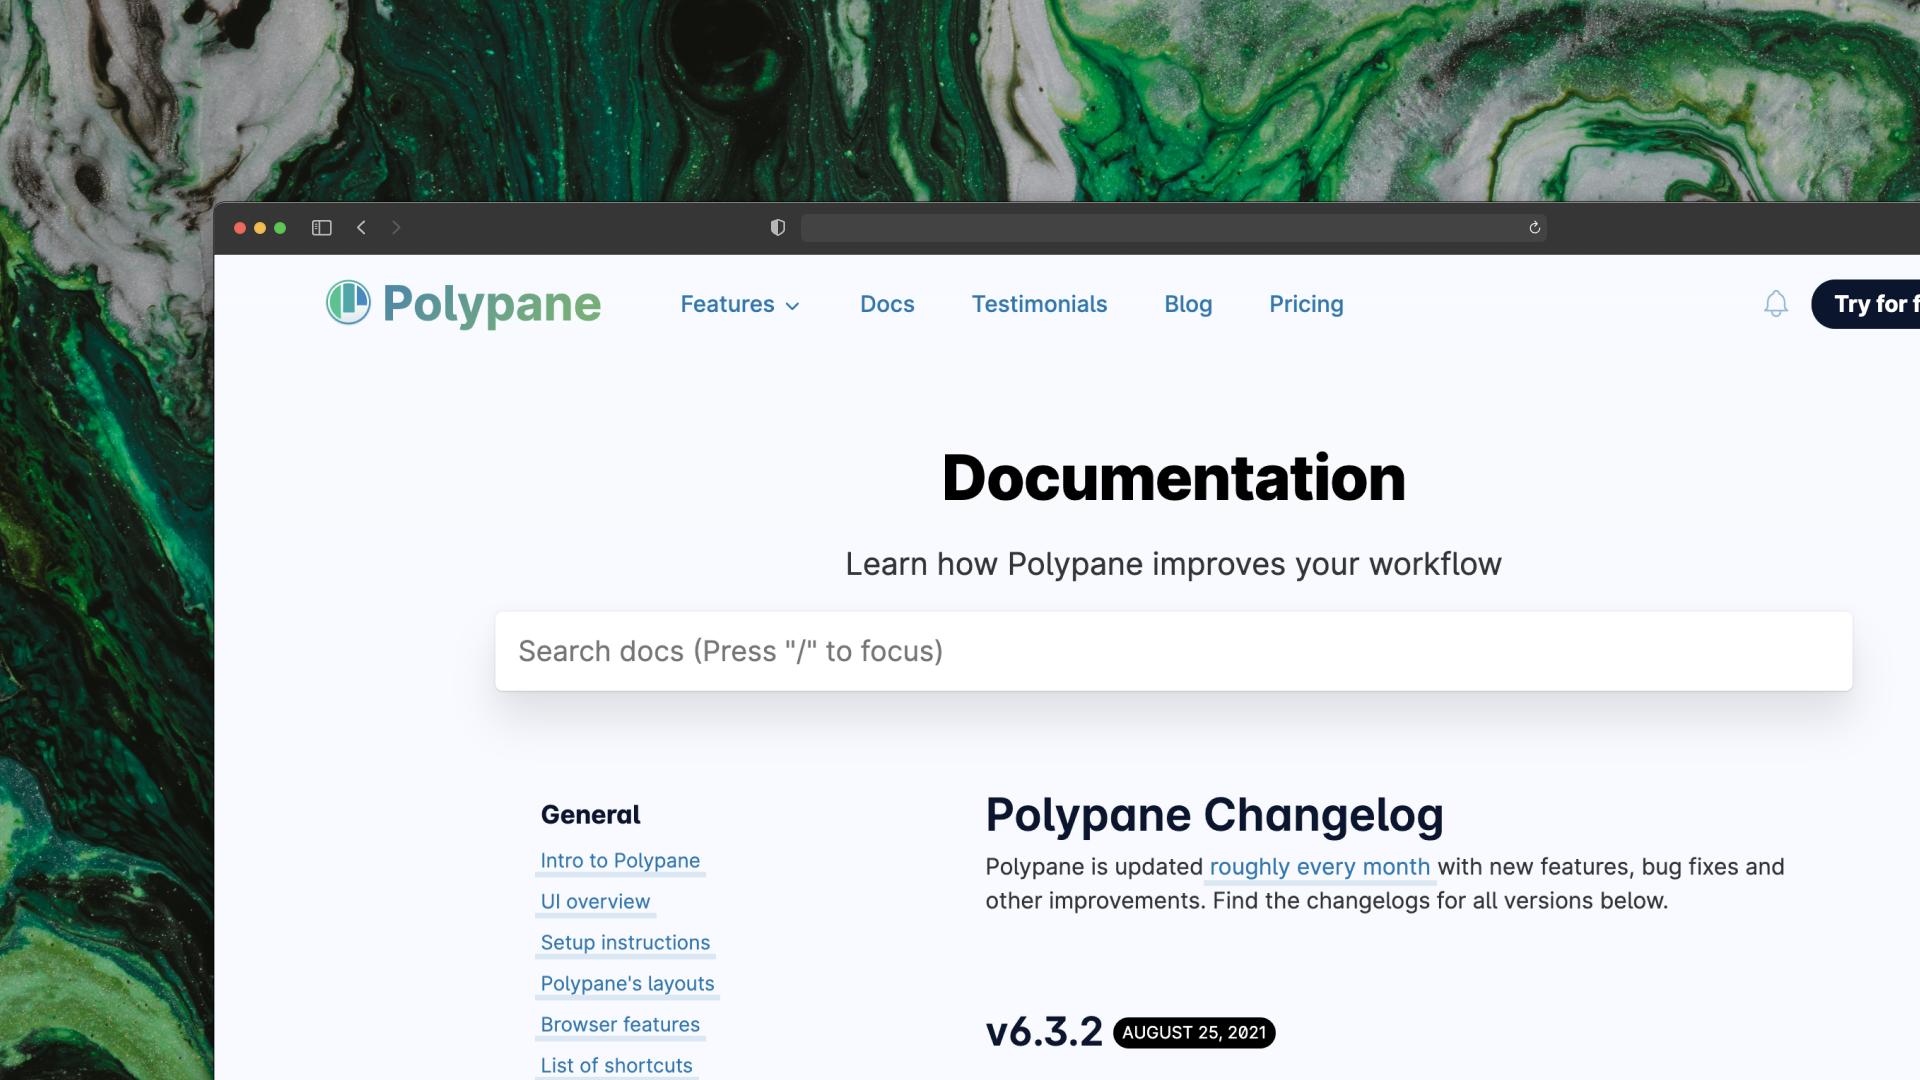 Polypane changelog screenshot